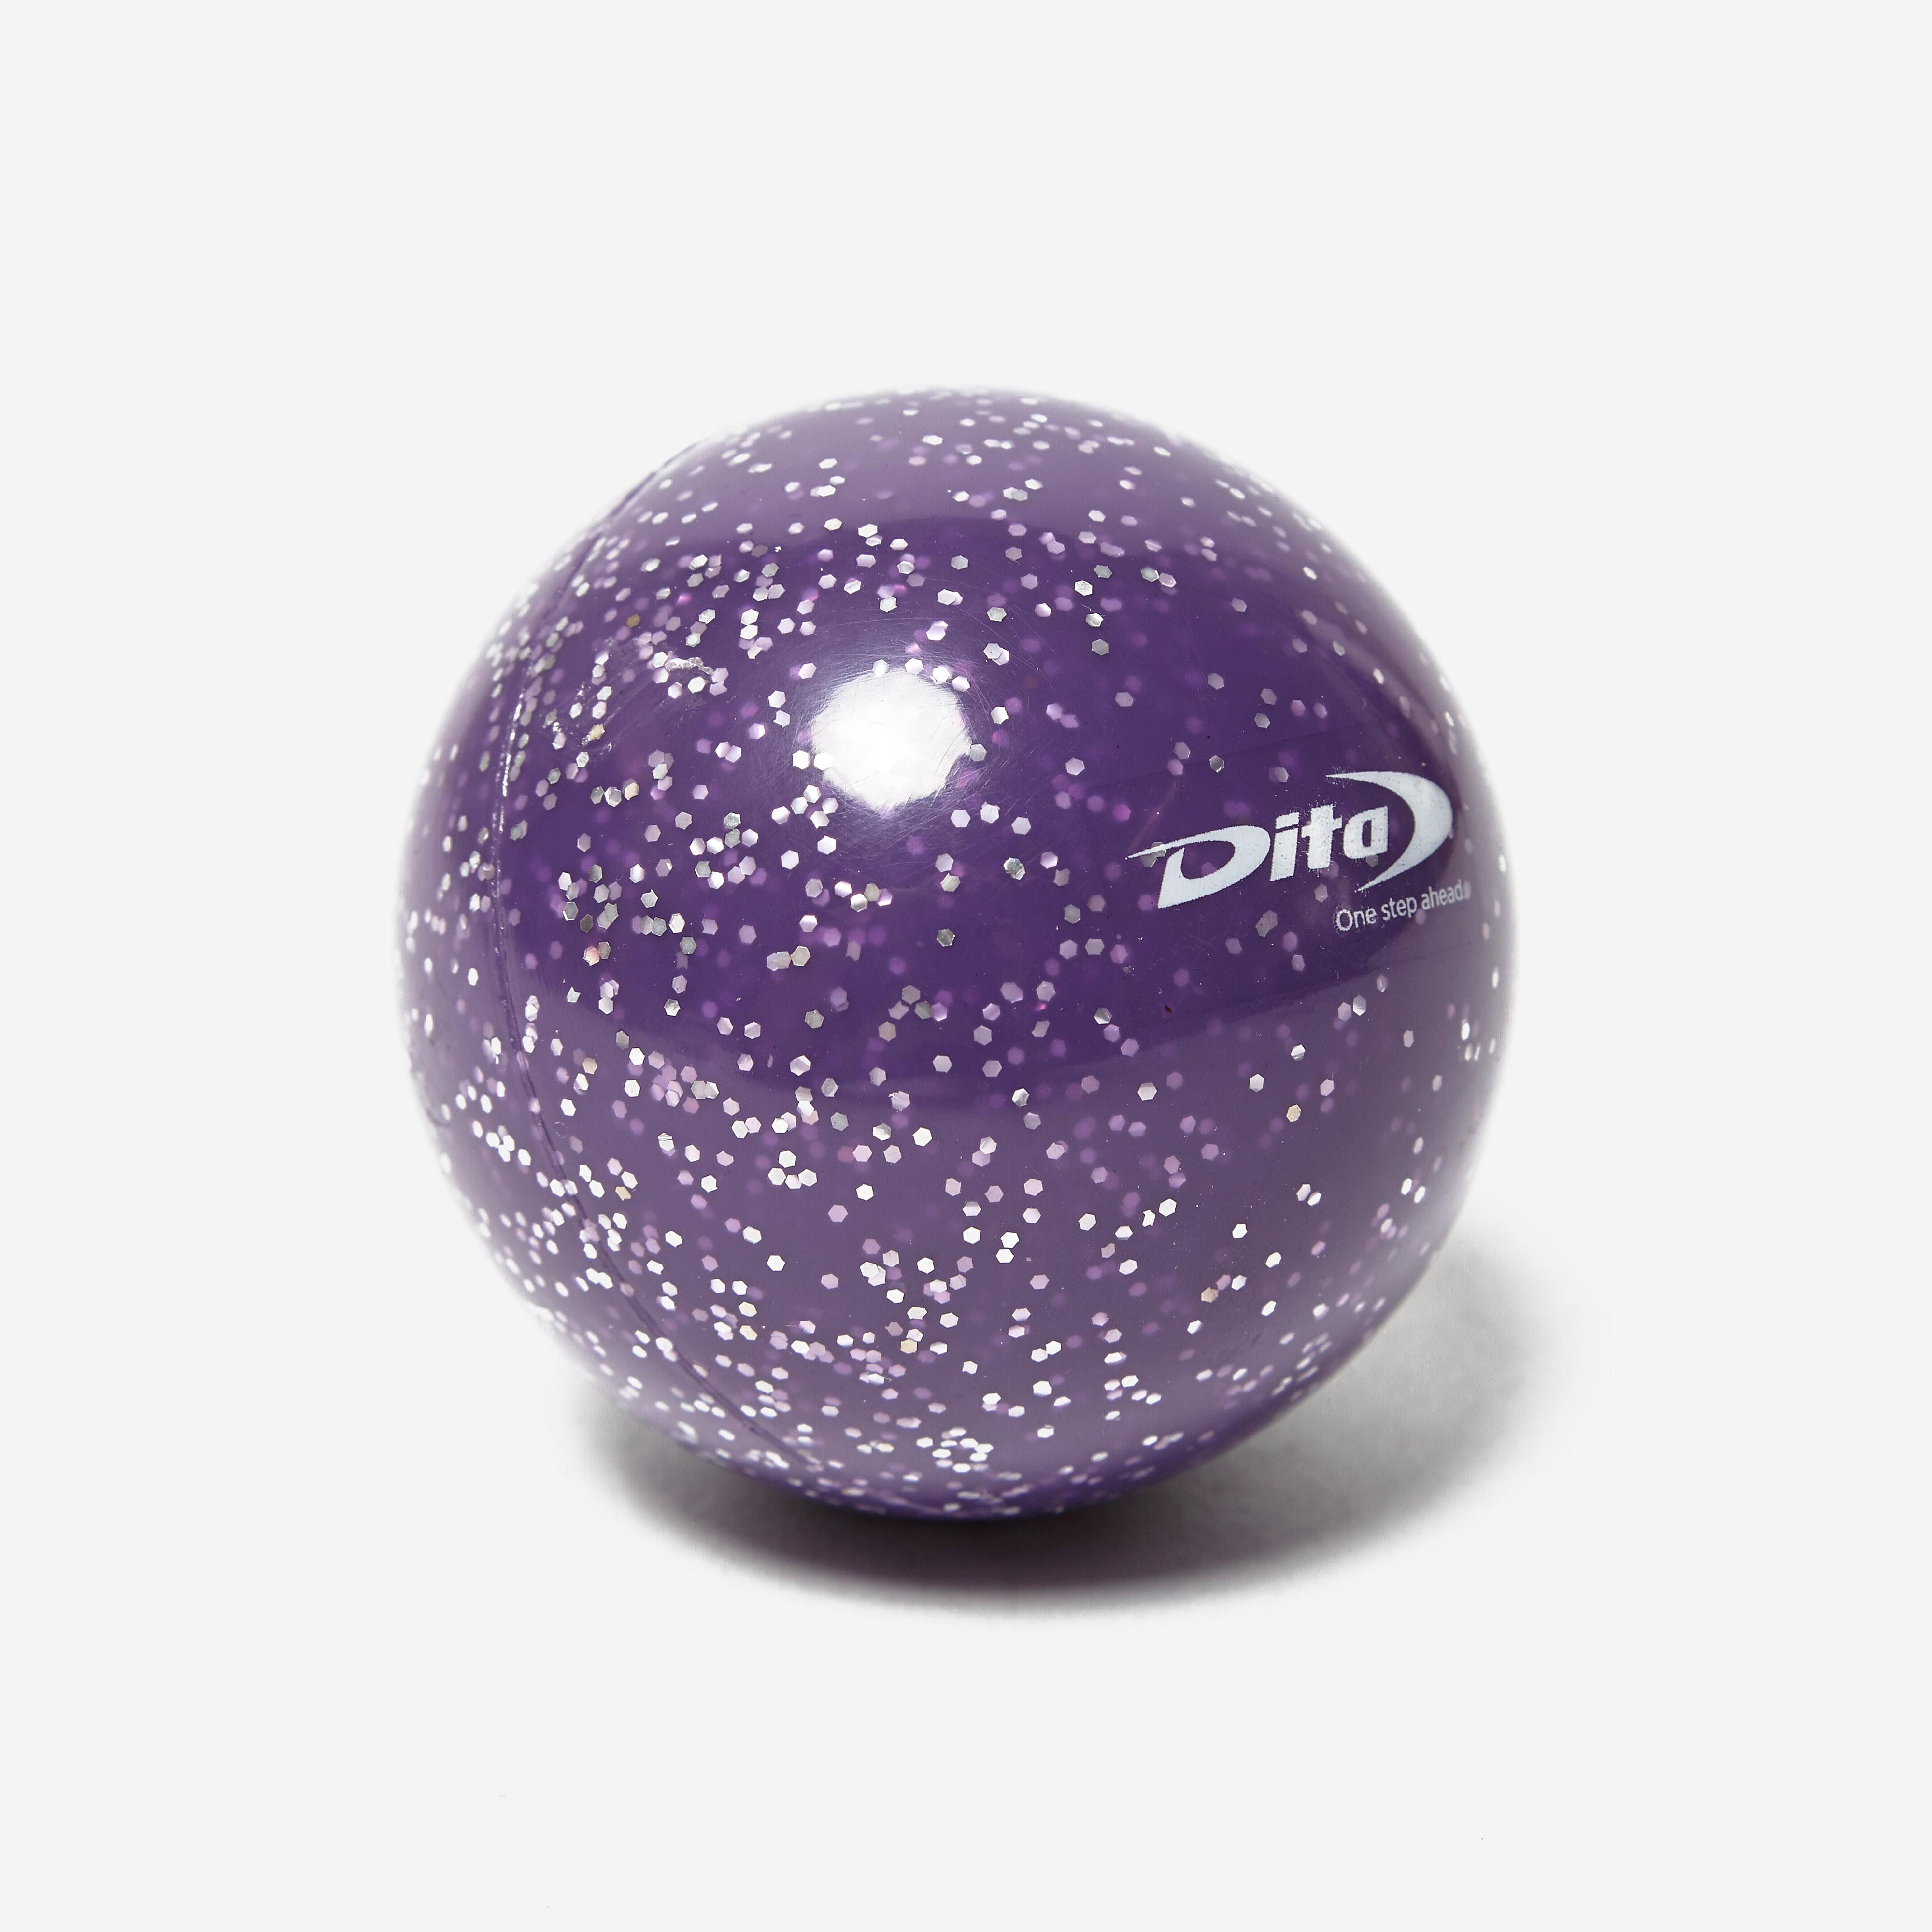 Dita BALL GLIT IN BLISTER